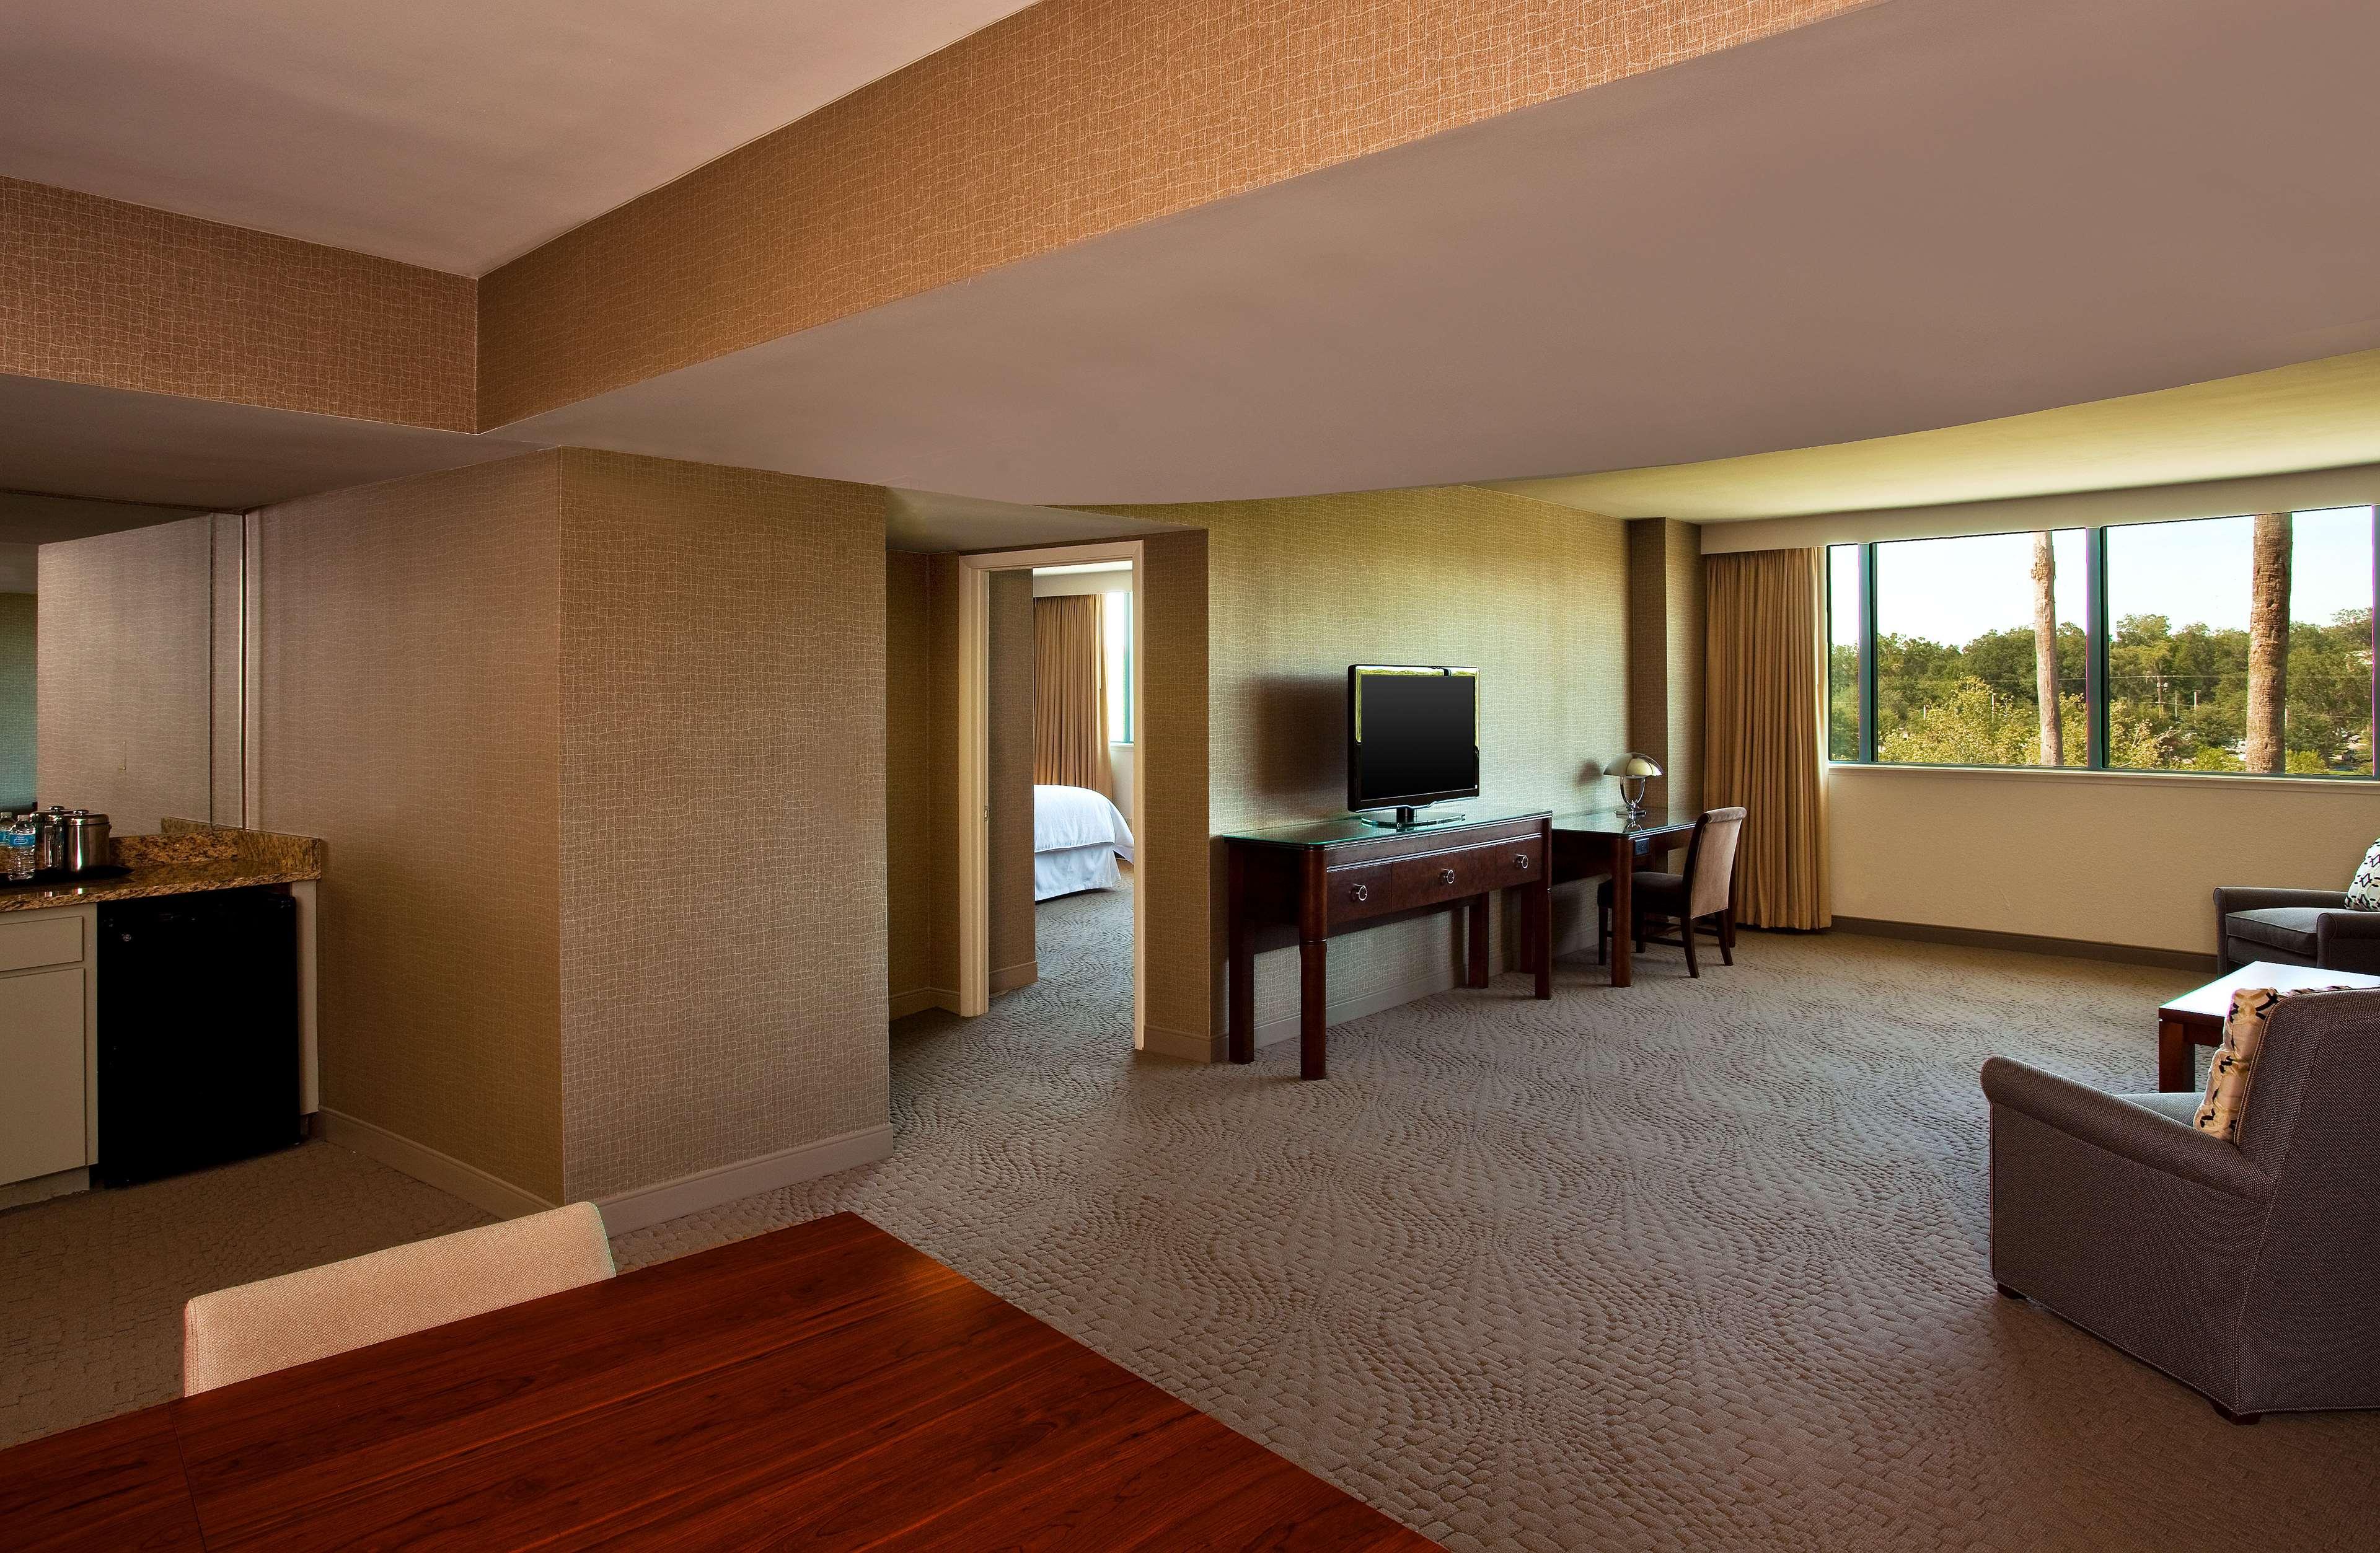 Sheraton Tampa Brandon Hotel image 3